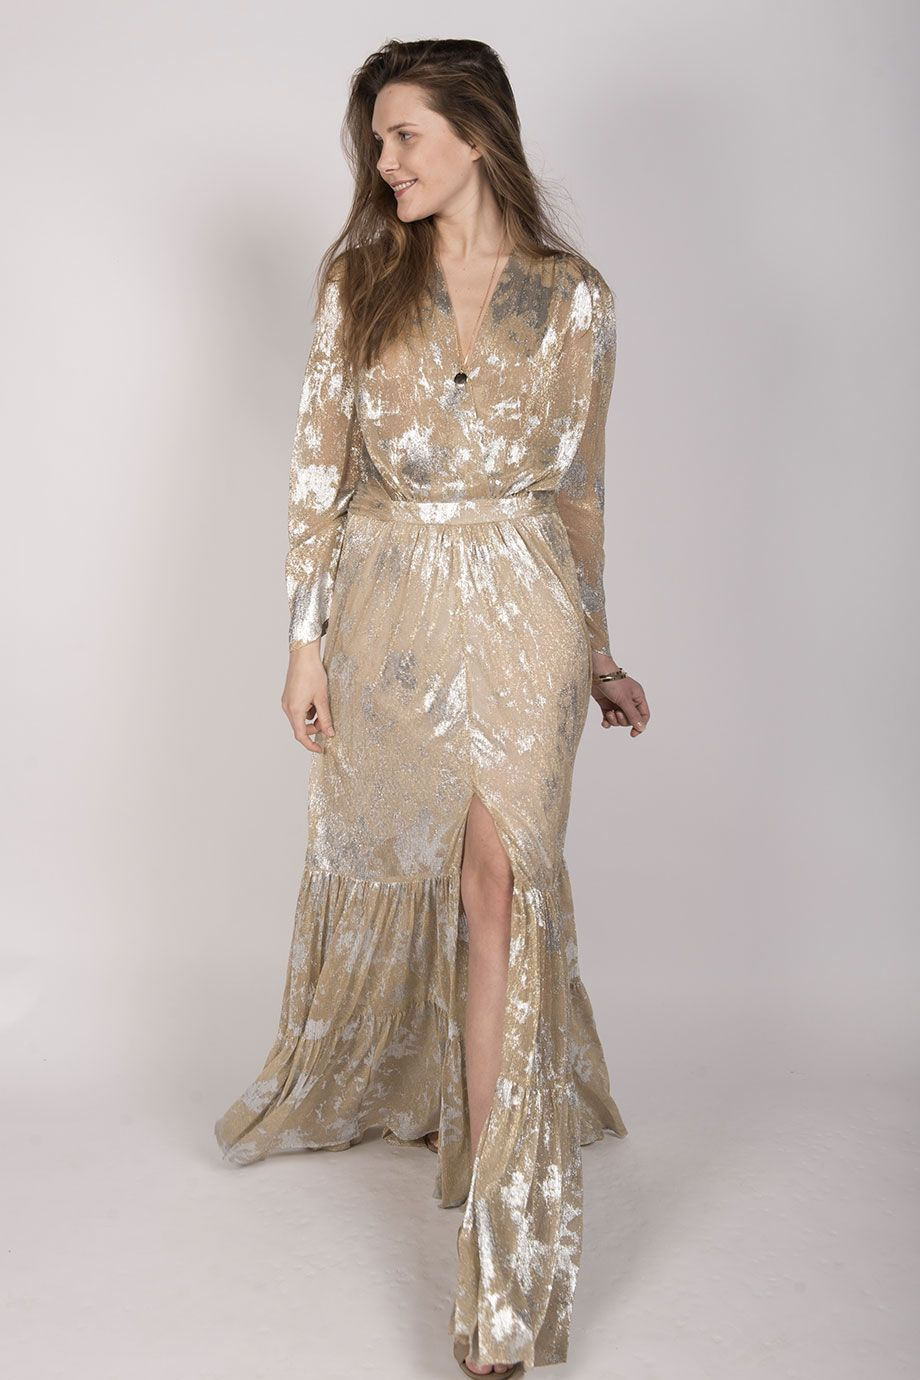 Louer robe marie laporte